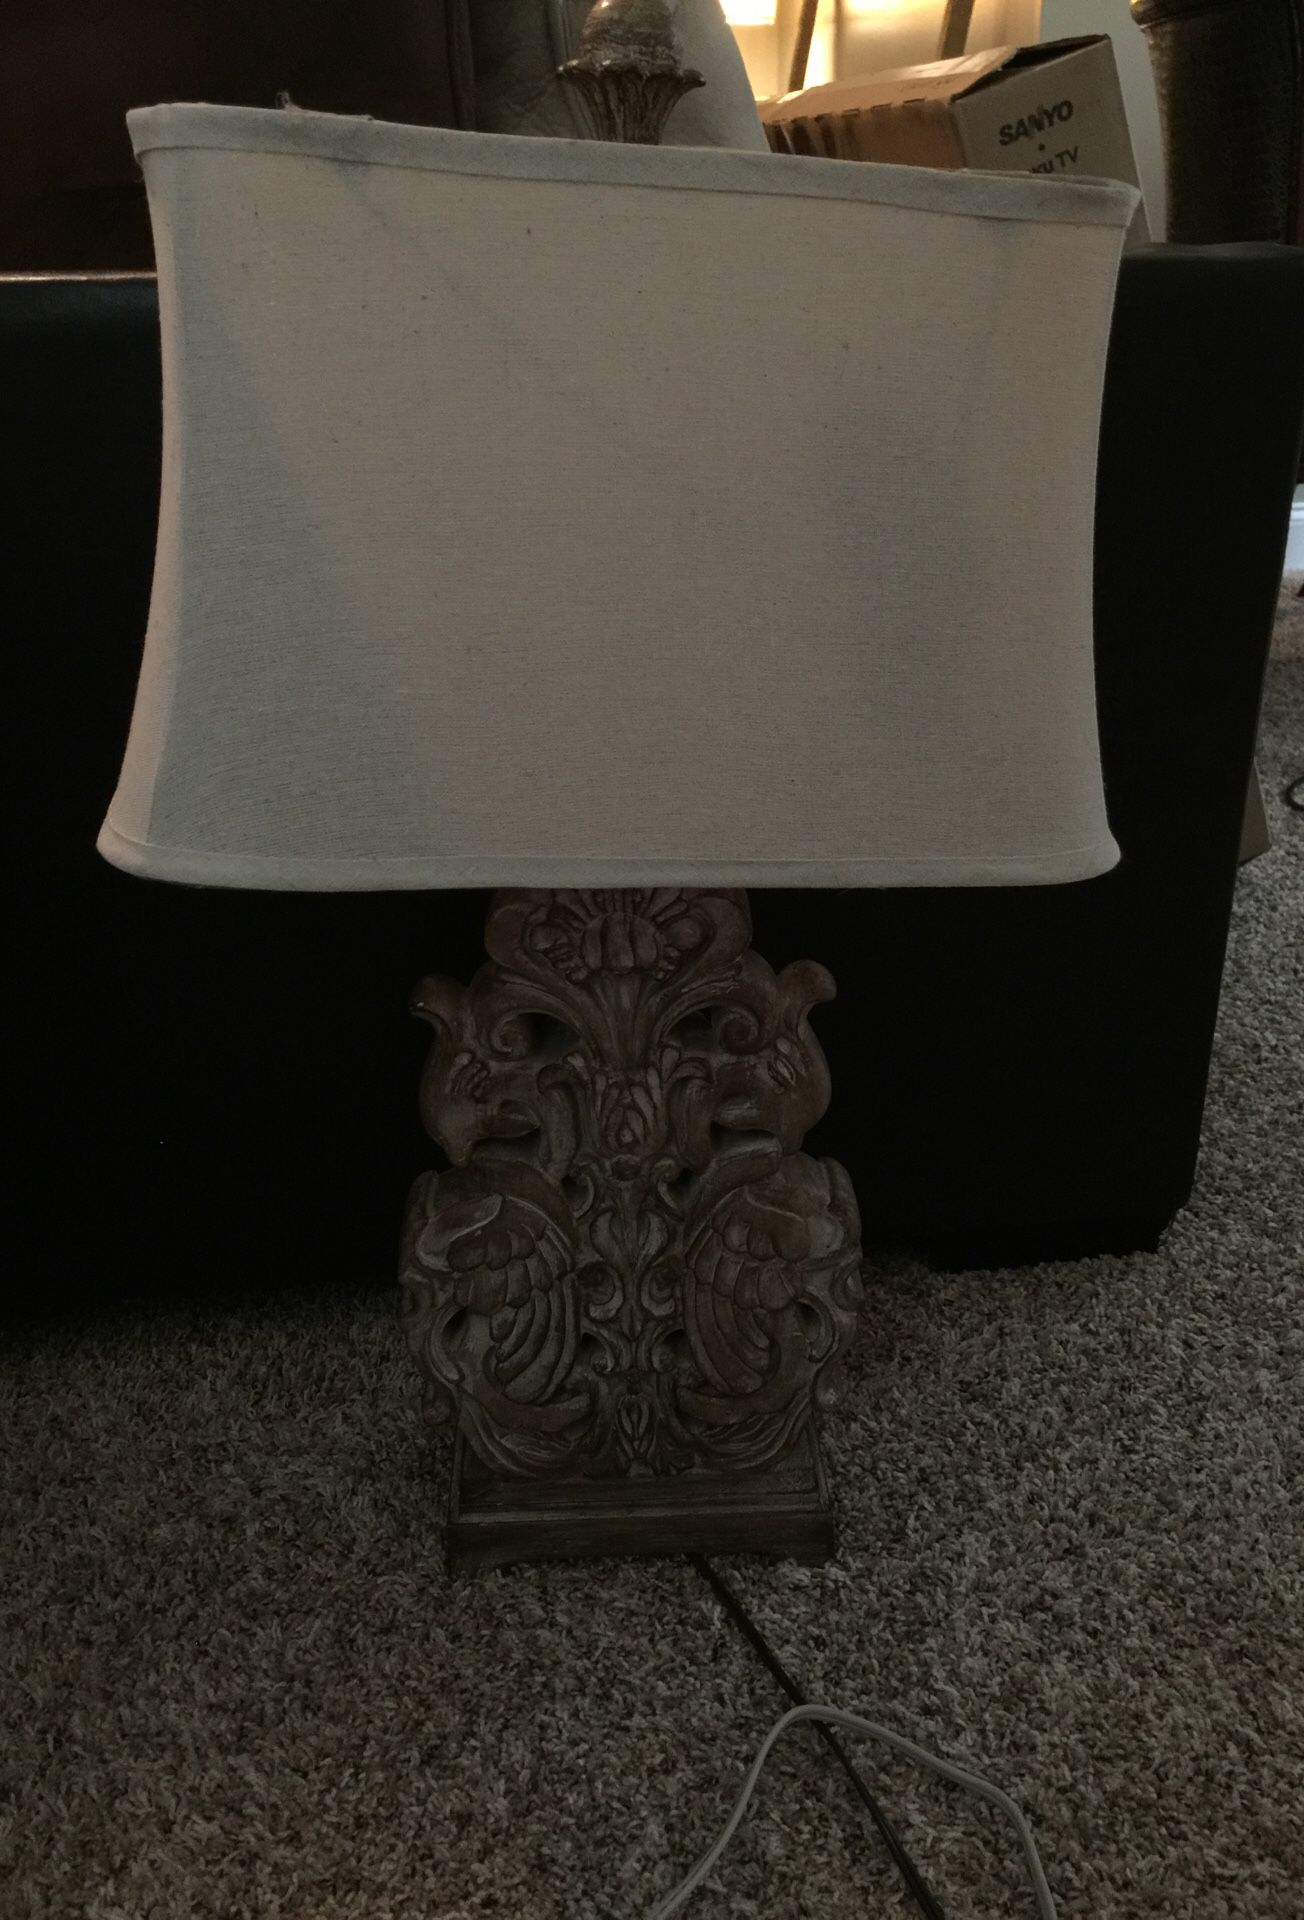 2 Lamps Medium Size